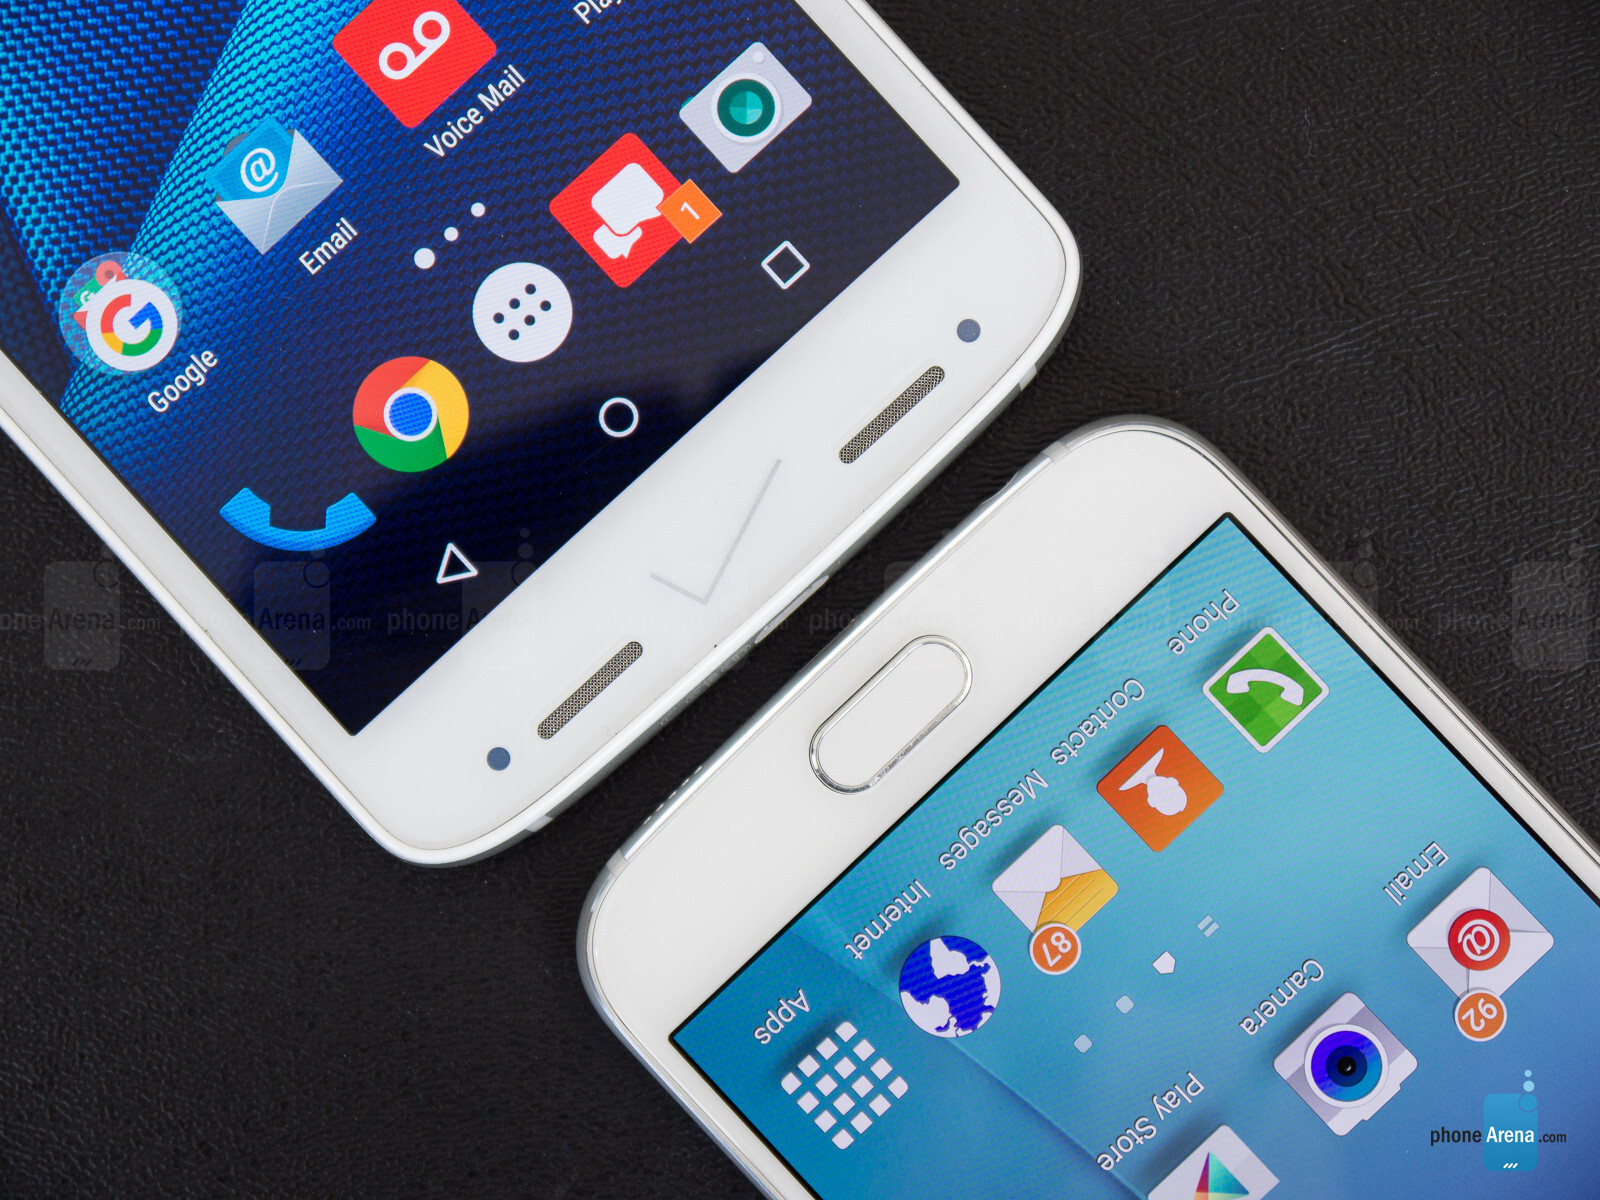 Motorola DROID Turbo 2 vs Samsung Galaxy S6 - PhoneArena